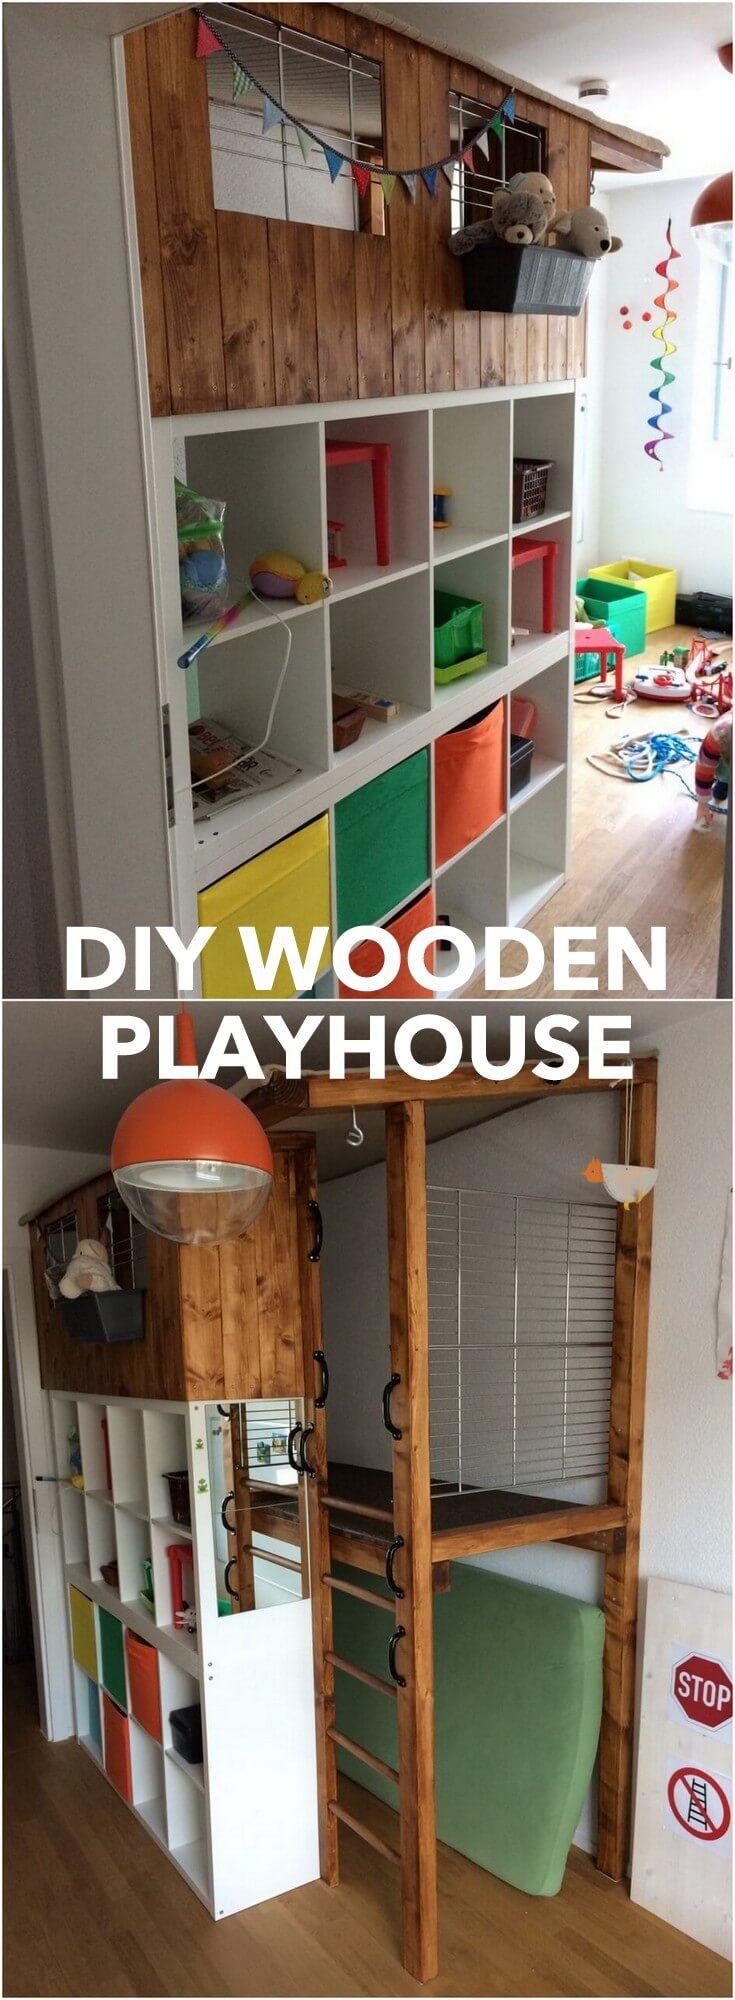 kallax wooden playhouse: kids adventure castle http://www